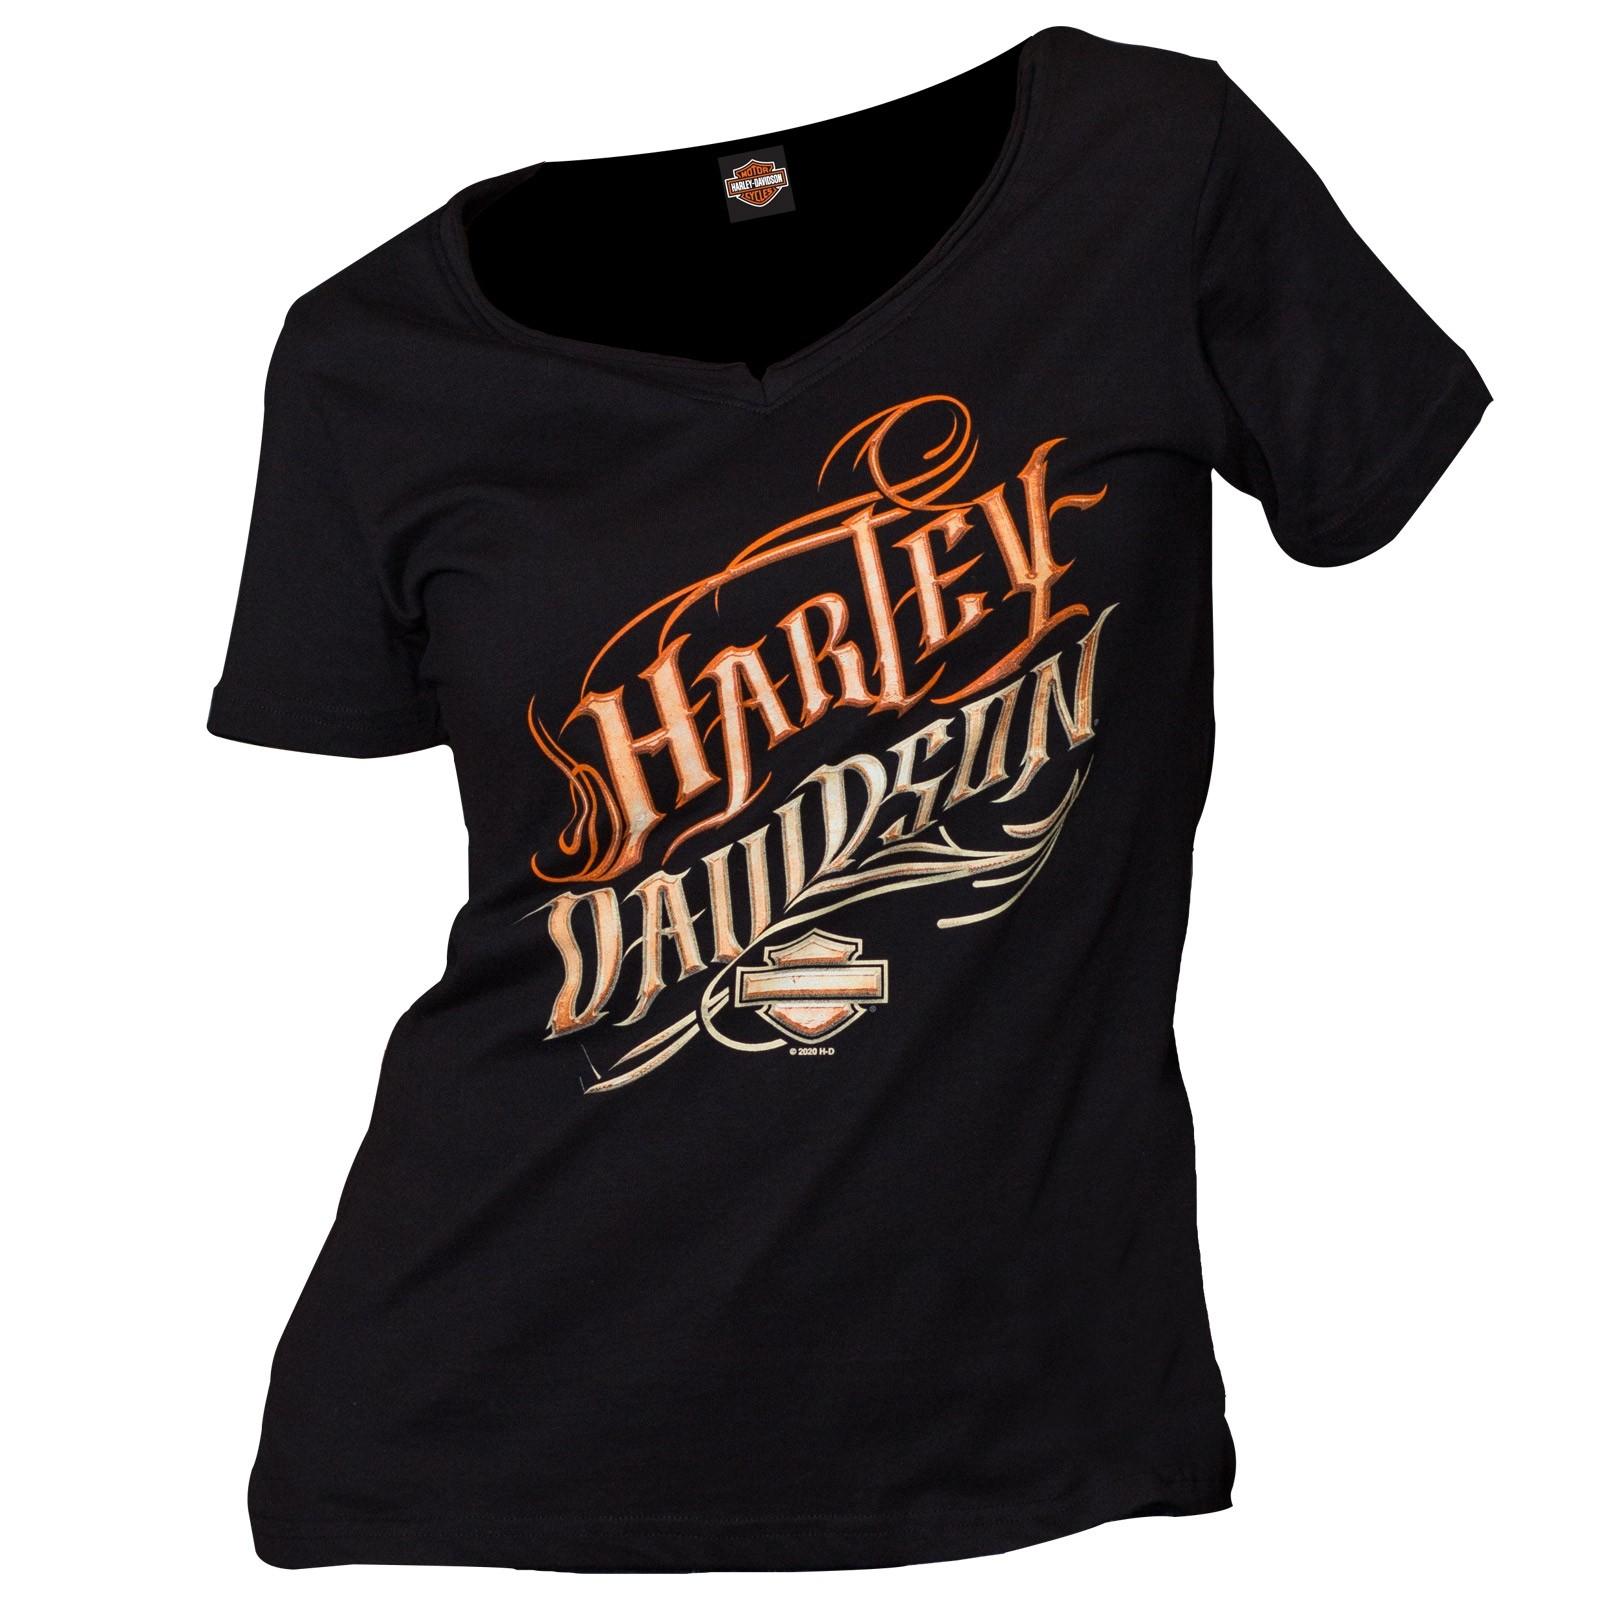 Harley-Davidson Military - Women's Black Graphic V-Neck T-Shirt - Baghdad, Iraq | Be Still